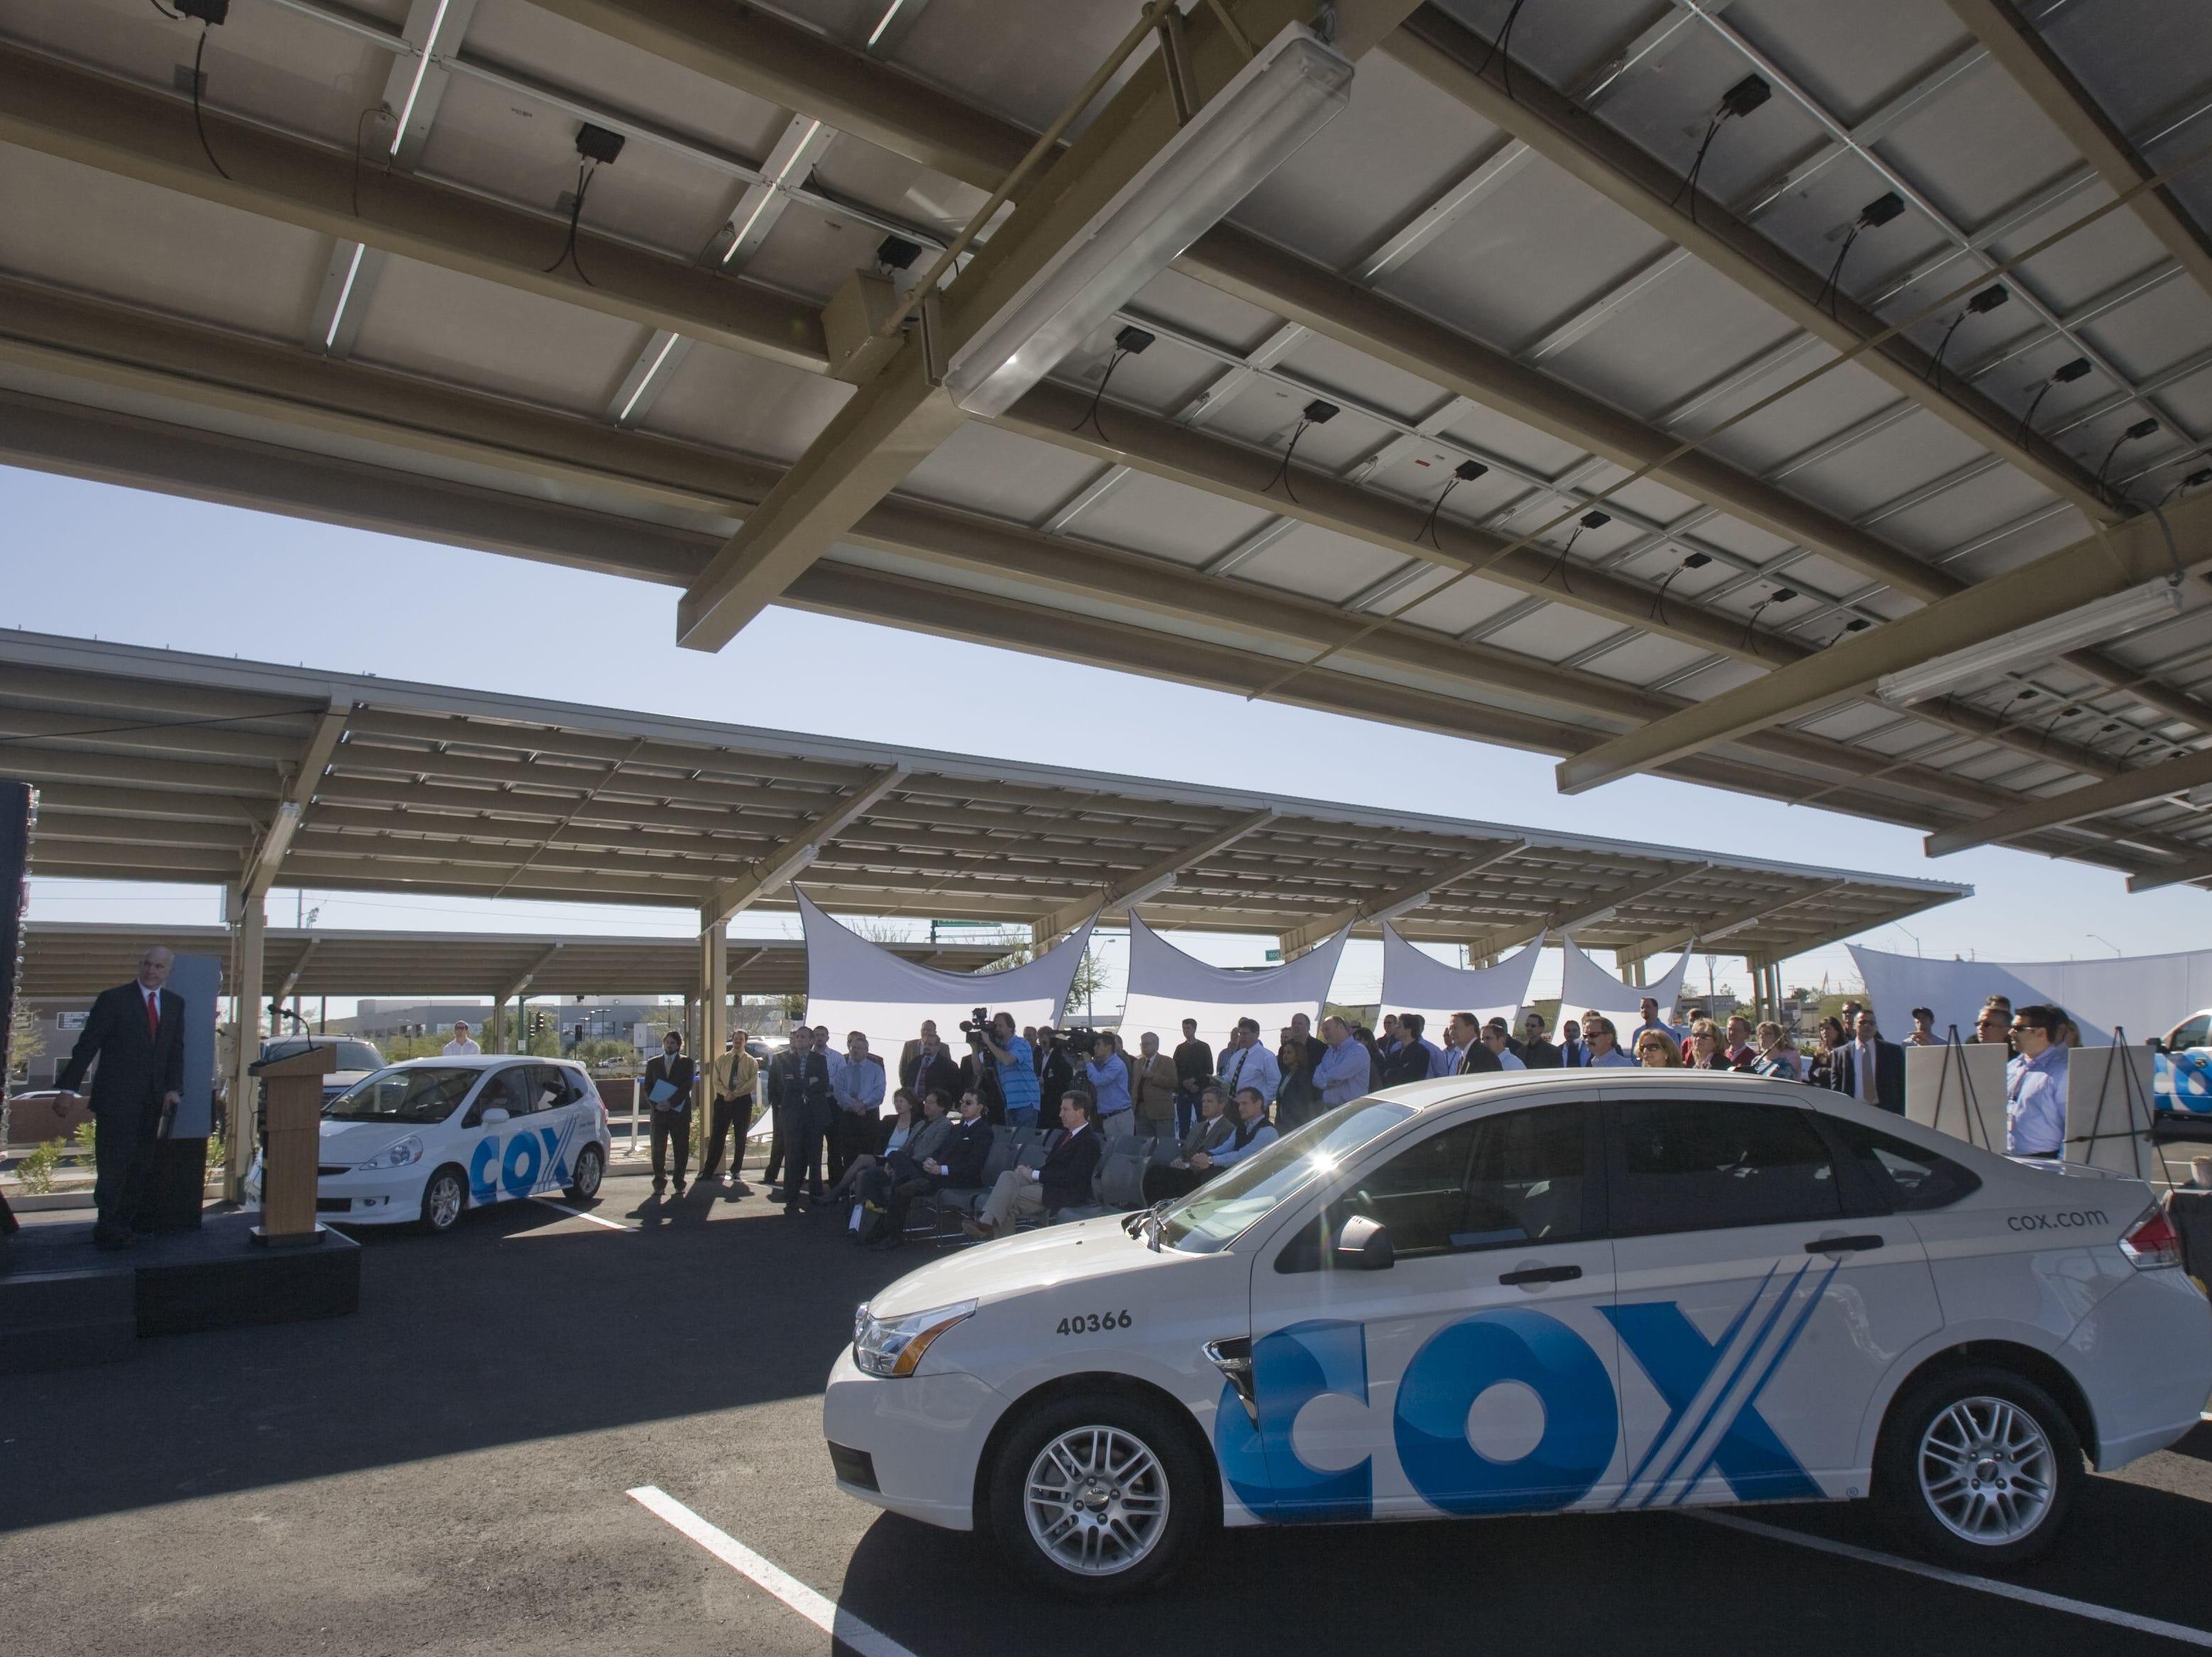 No. 45: Cox Enterprises | Cable TV, automotive auctions, logistics | 2019 employees: 3,986 | 2018 employees: 3,935 | Ownership: Private | Headquarters: Atlanta | www.cox.com